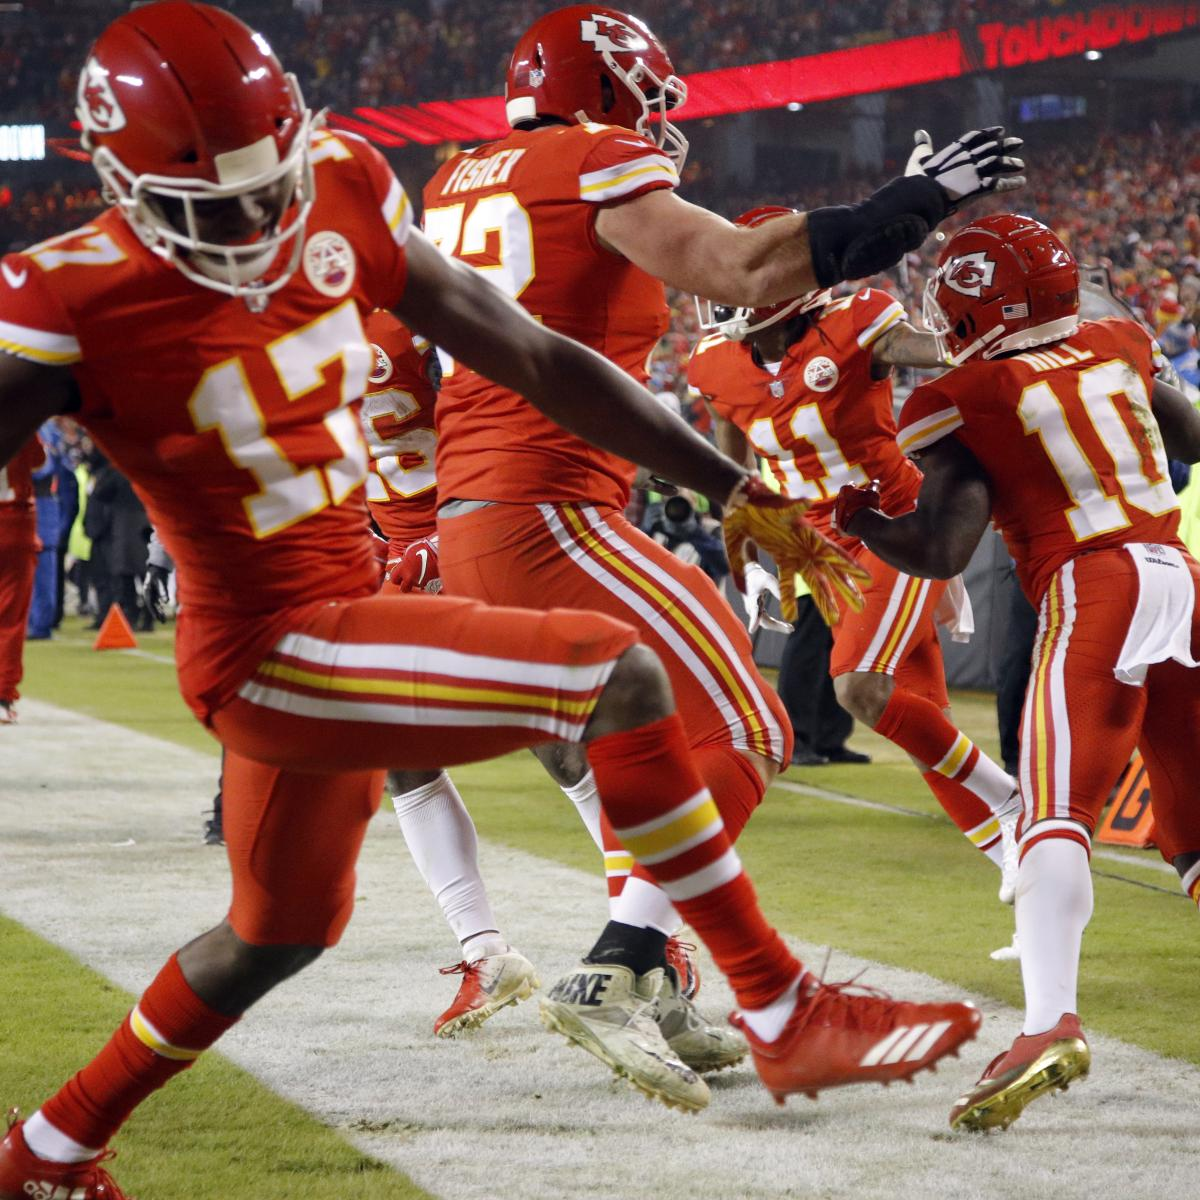 NFL Playoff Scenarios 2019: Latest Bracket Picture, Vegas